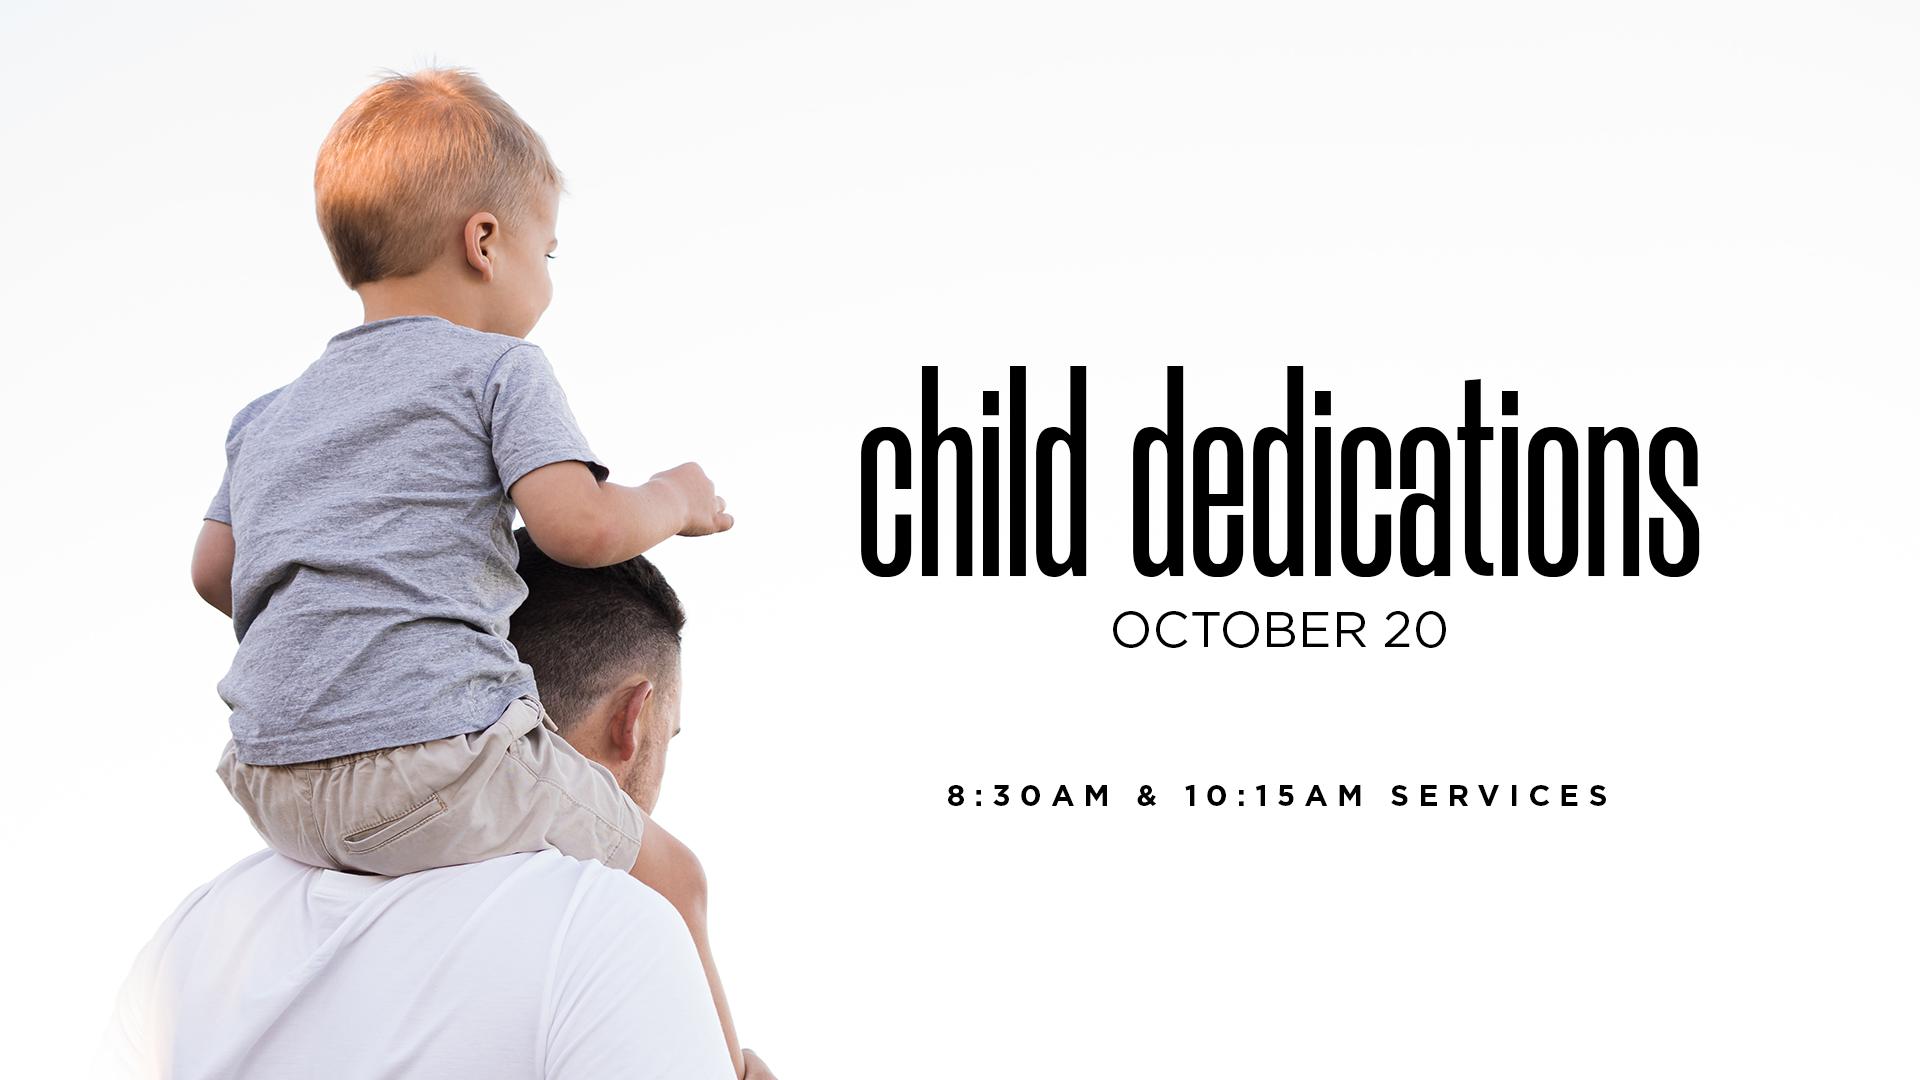 ChildDedications_Oct20_FBSLIDE.png